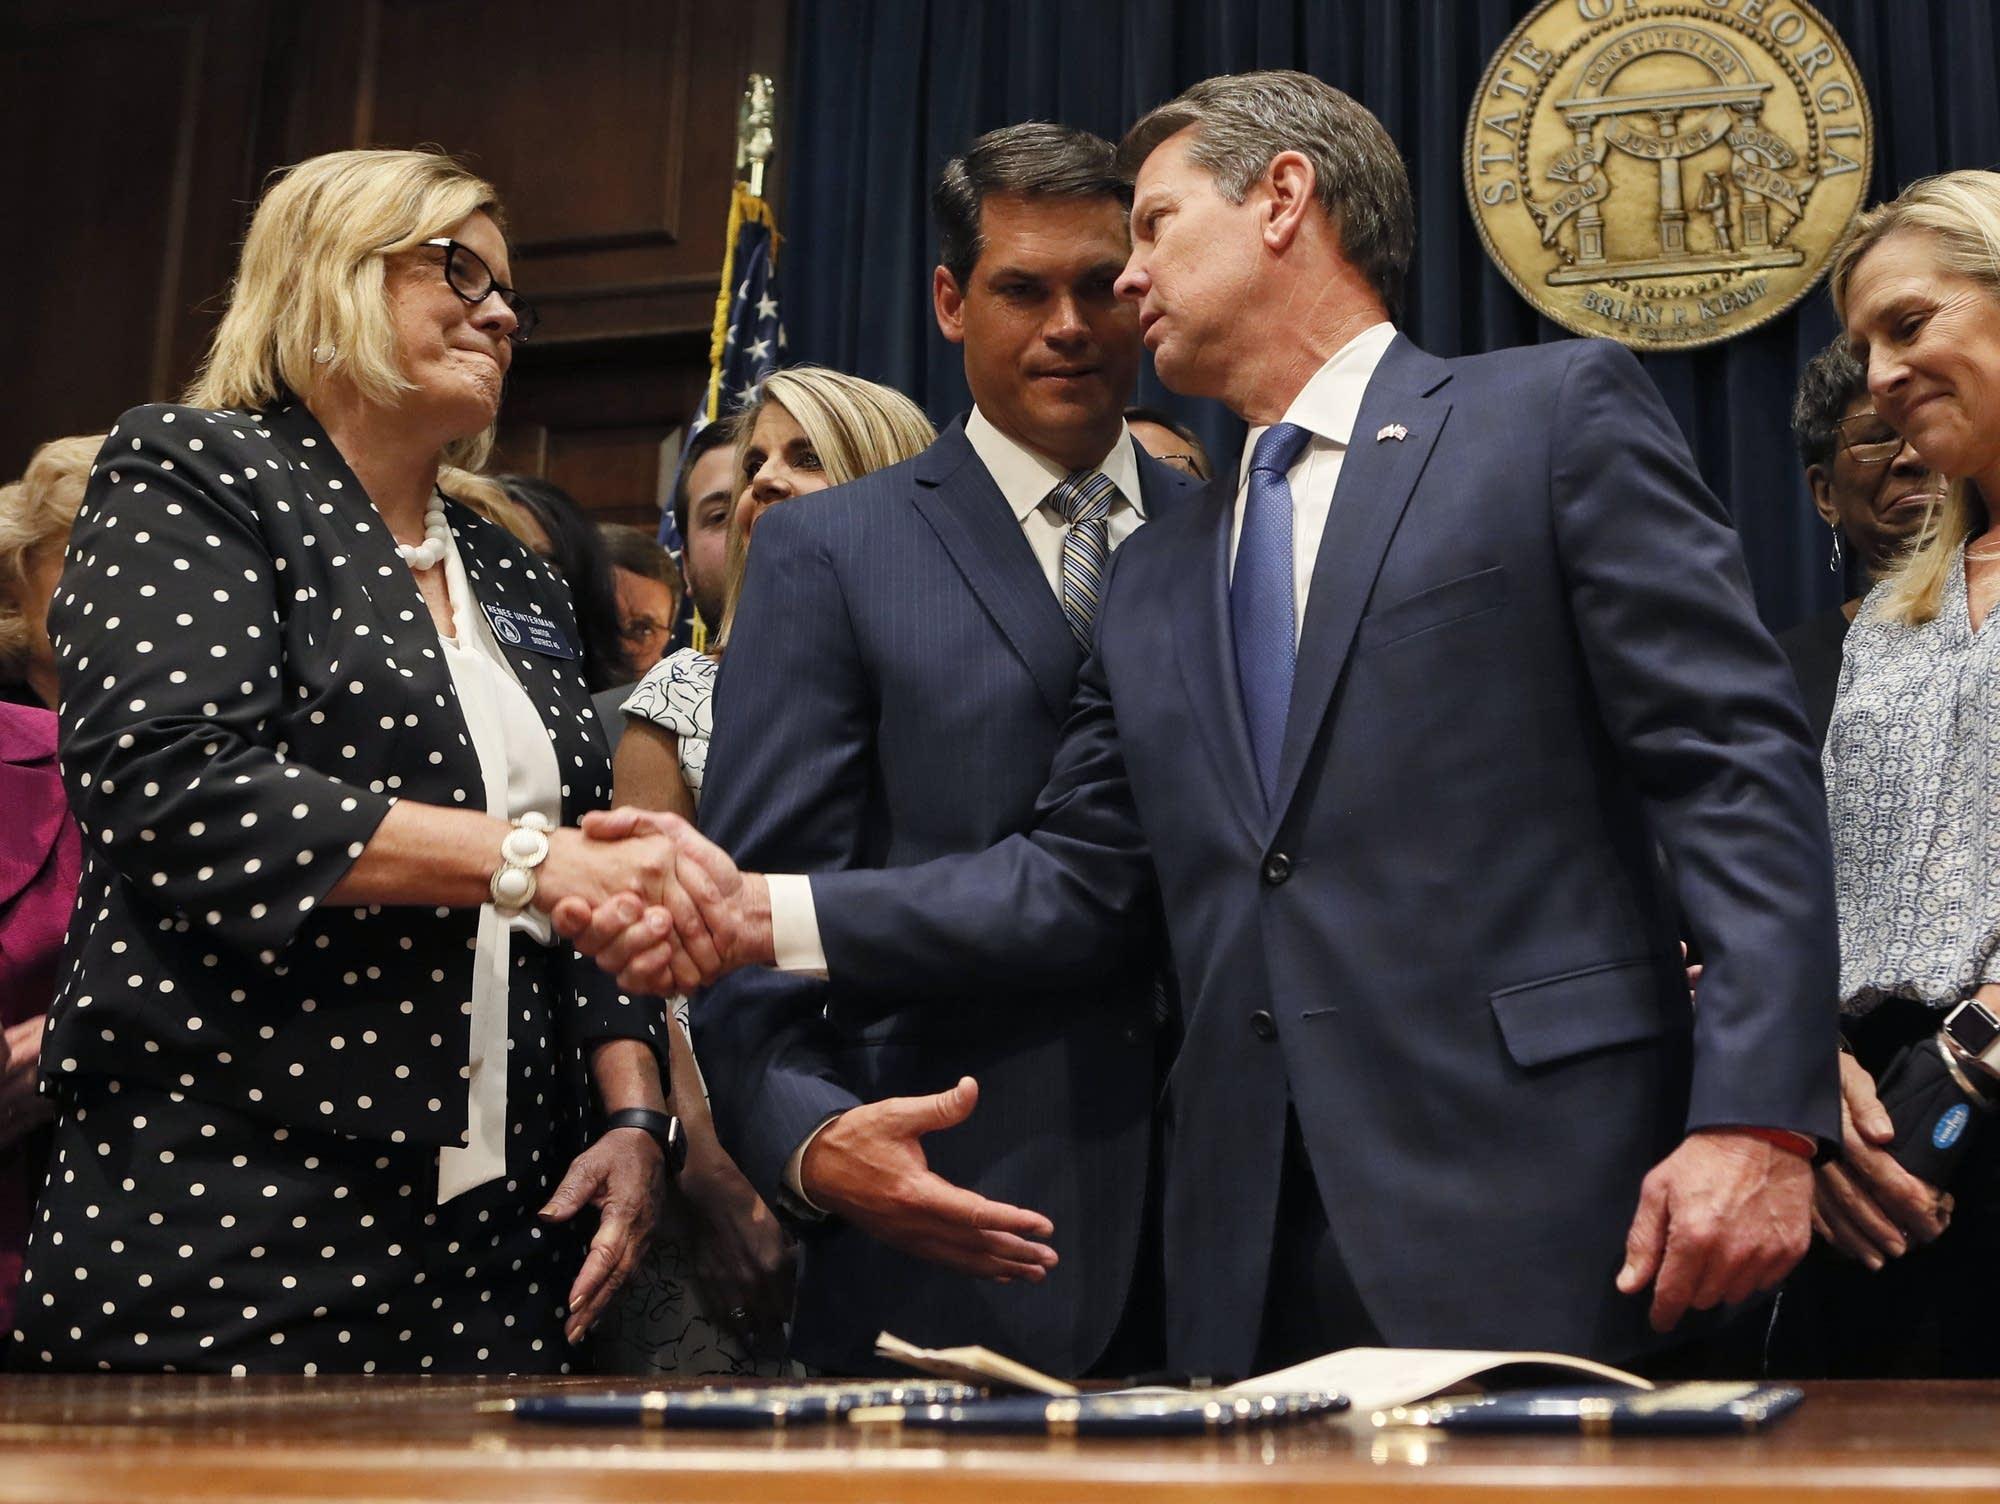 Georgia's Republican Gov. Brian Kemp